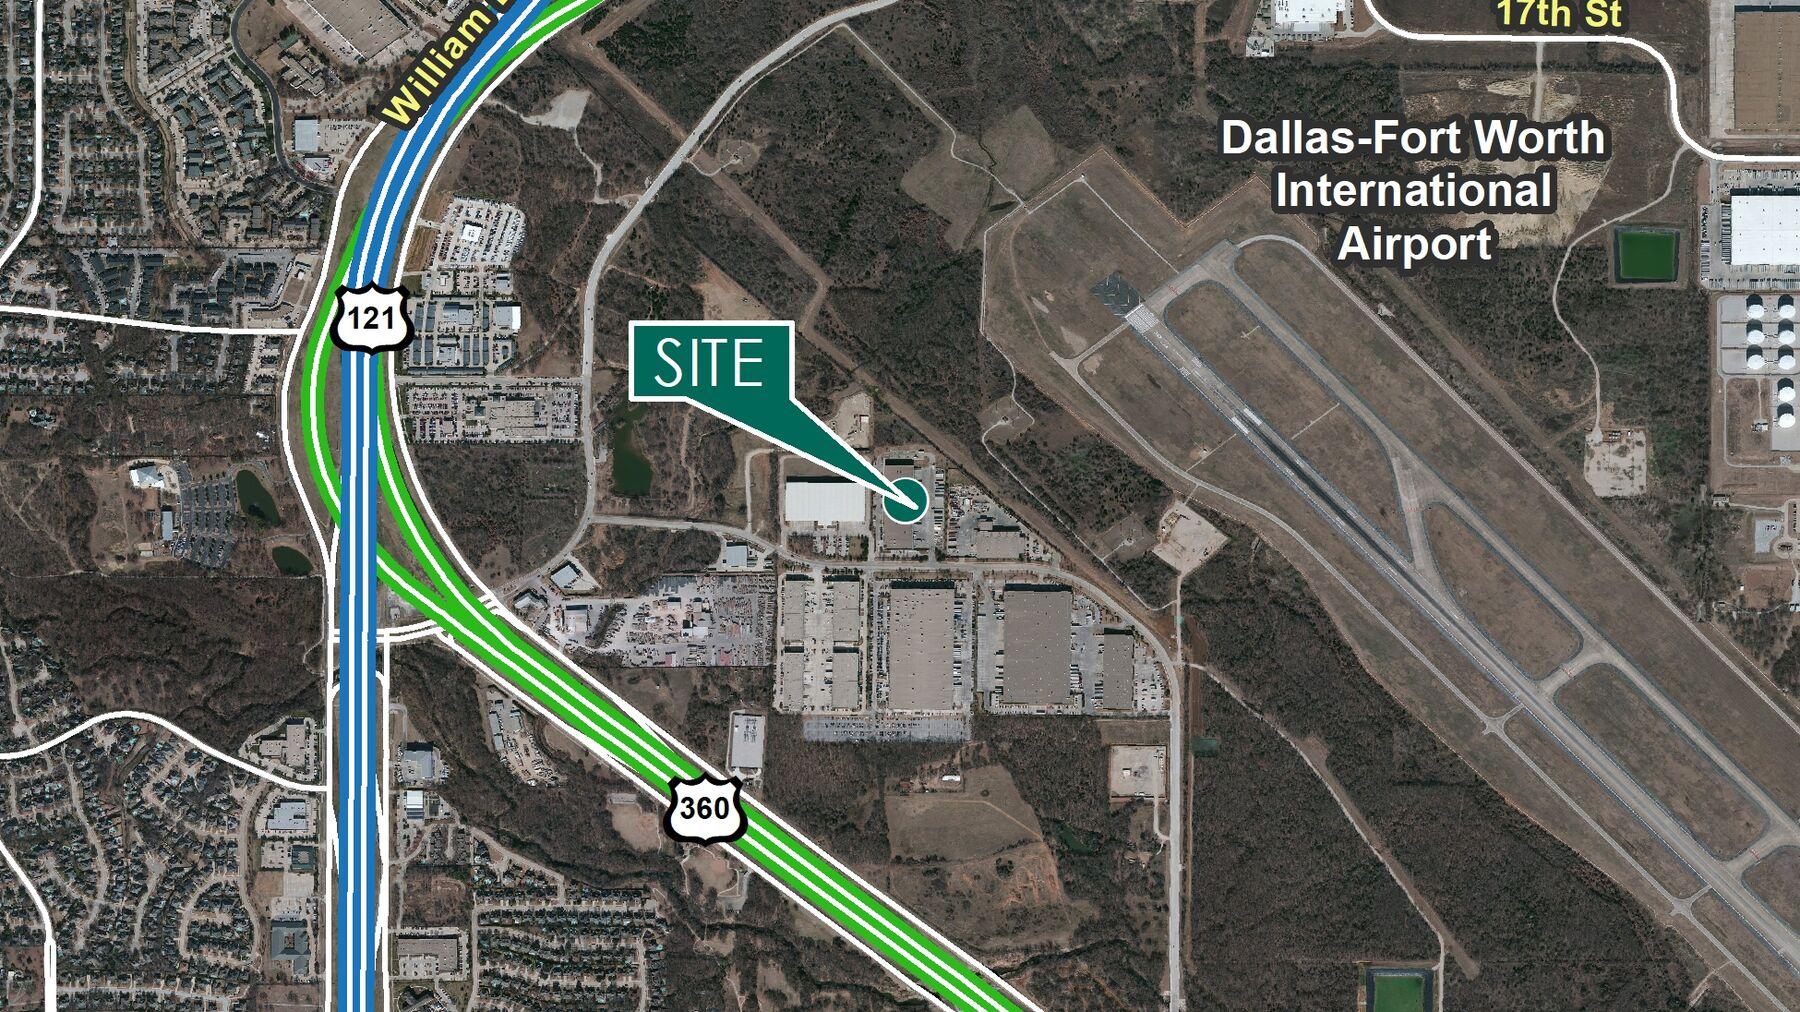 DPM-Prologis-DFW-9-DAL10609-620-Westport-Parkway_AerialMap.jpg